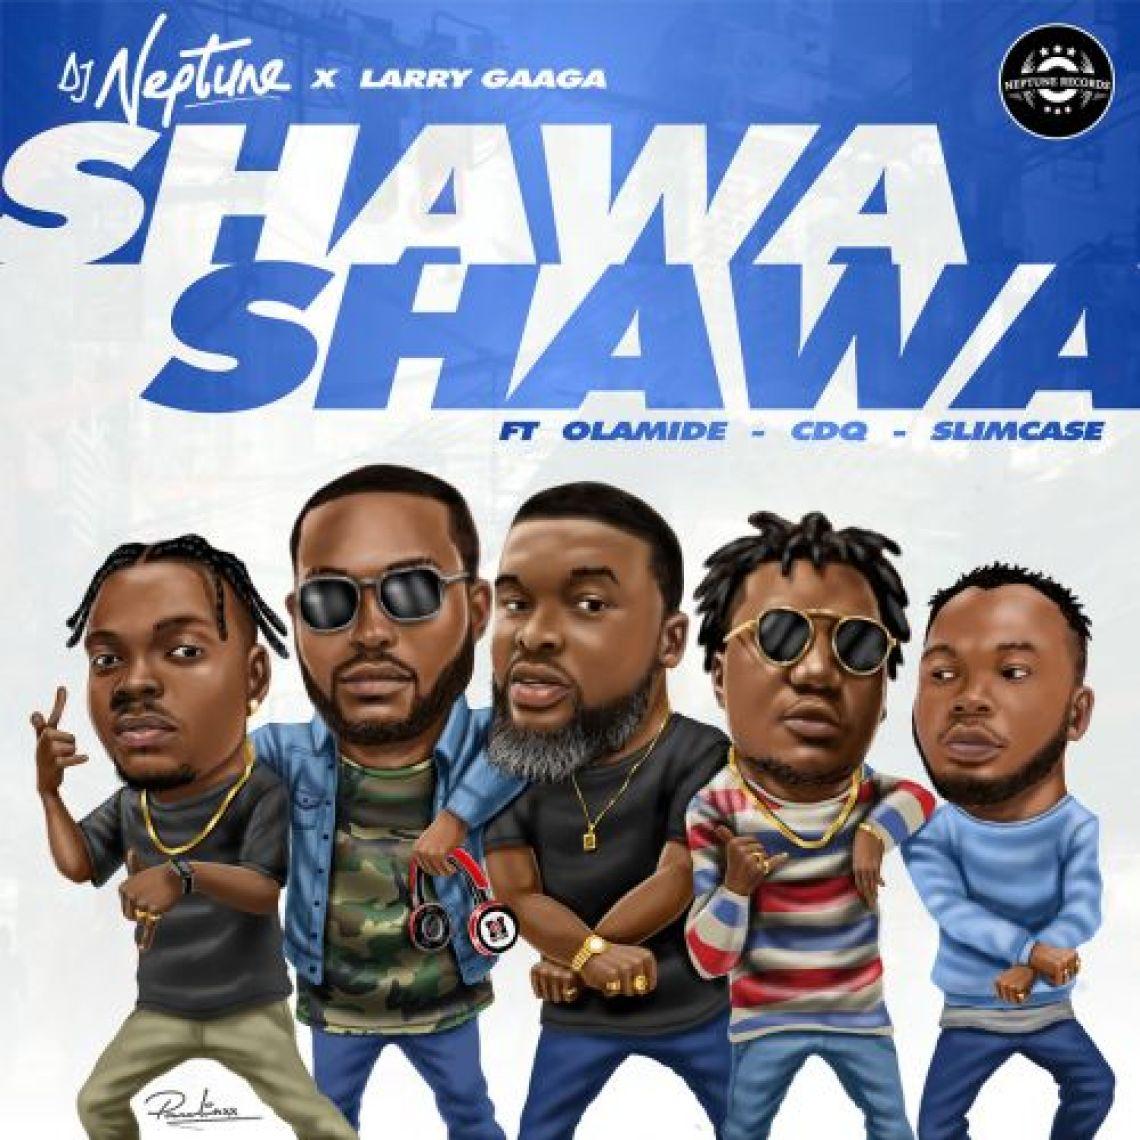 DJ Neptune - Shawa Shawa Ft. Olamide , CDQ, Slim Case & Larry Gaaga